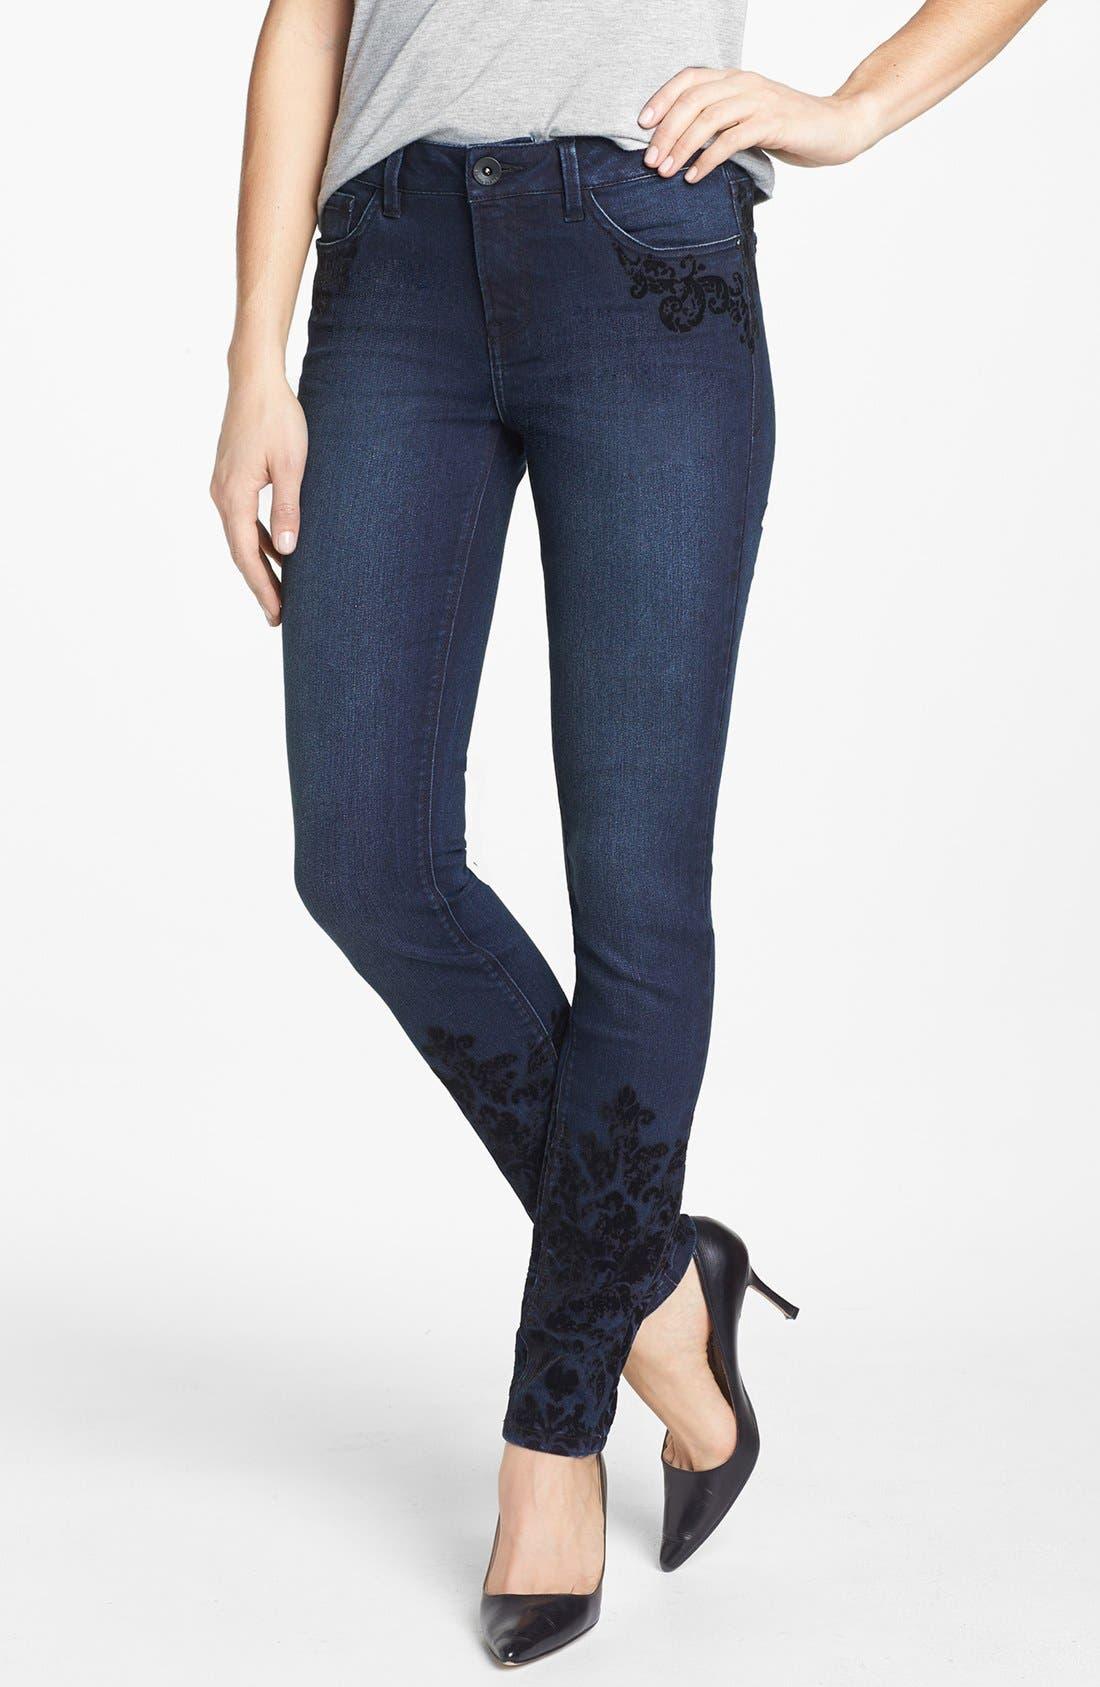 Alternate Image 1 Selected - kensie 'Ankle Biter' Flocked Skinny Jeans (Midnight)